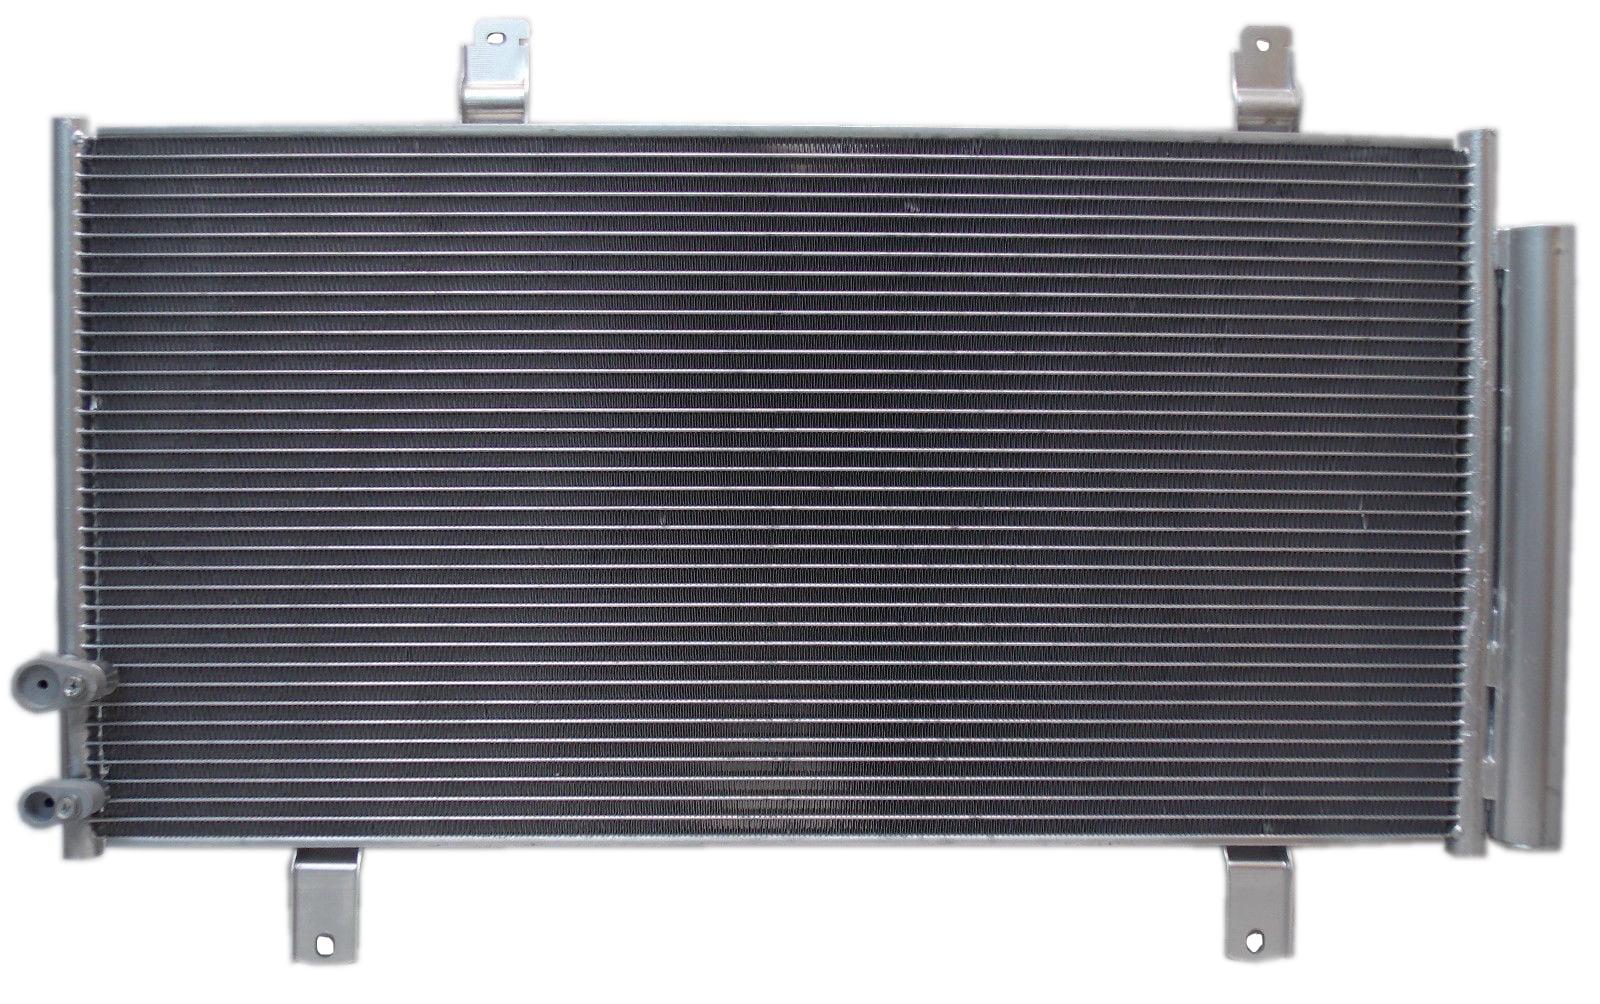 AC Condenser Radiator New Set Fit for 2007-2012 Lexus ES350 3.5L V6